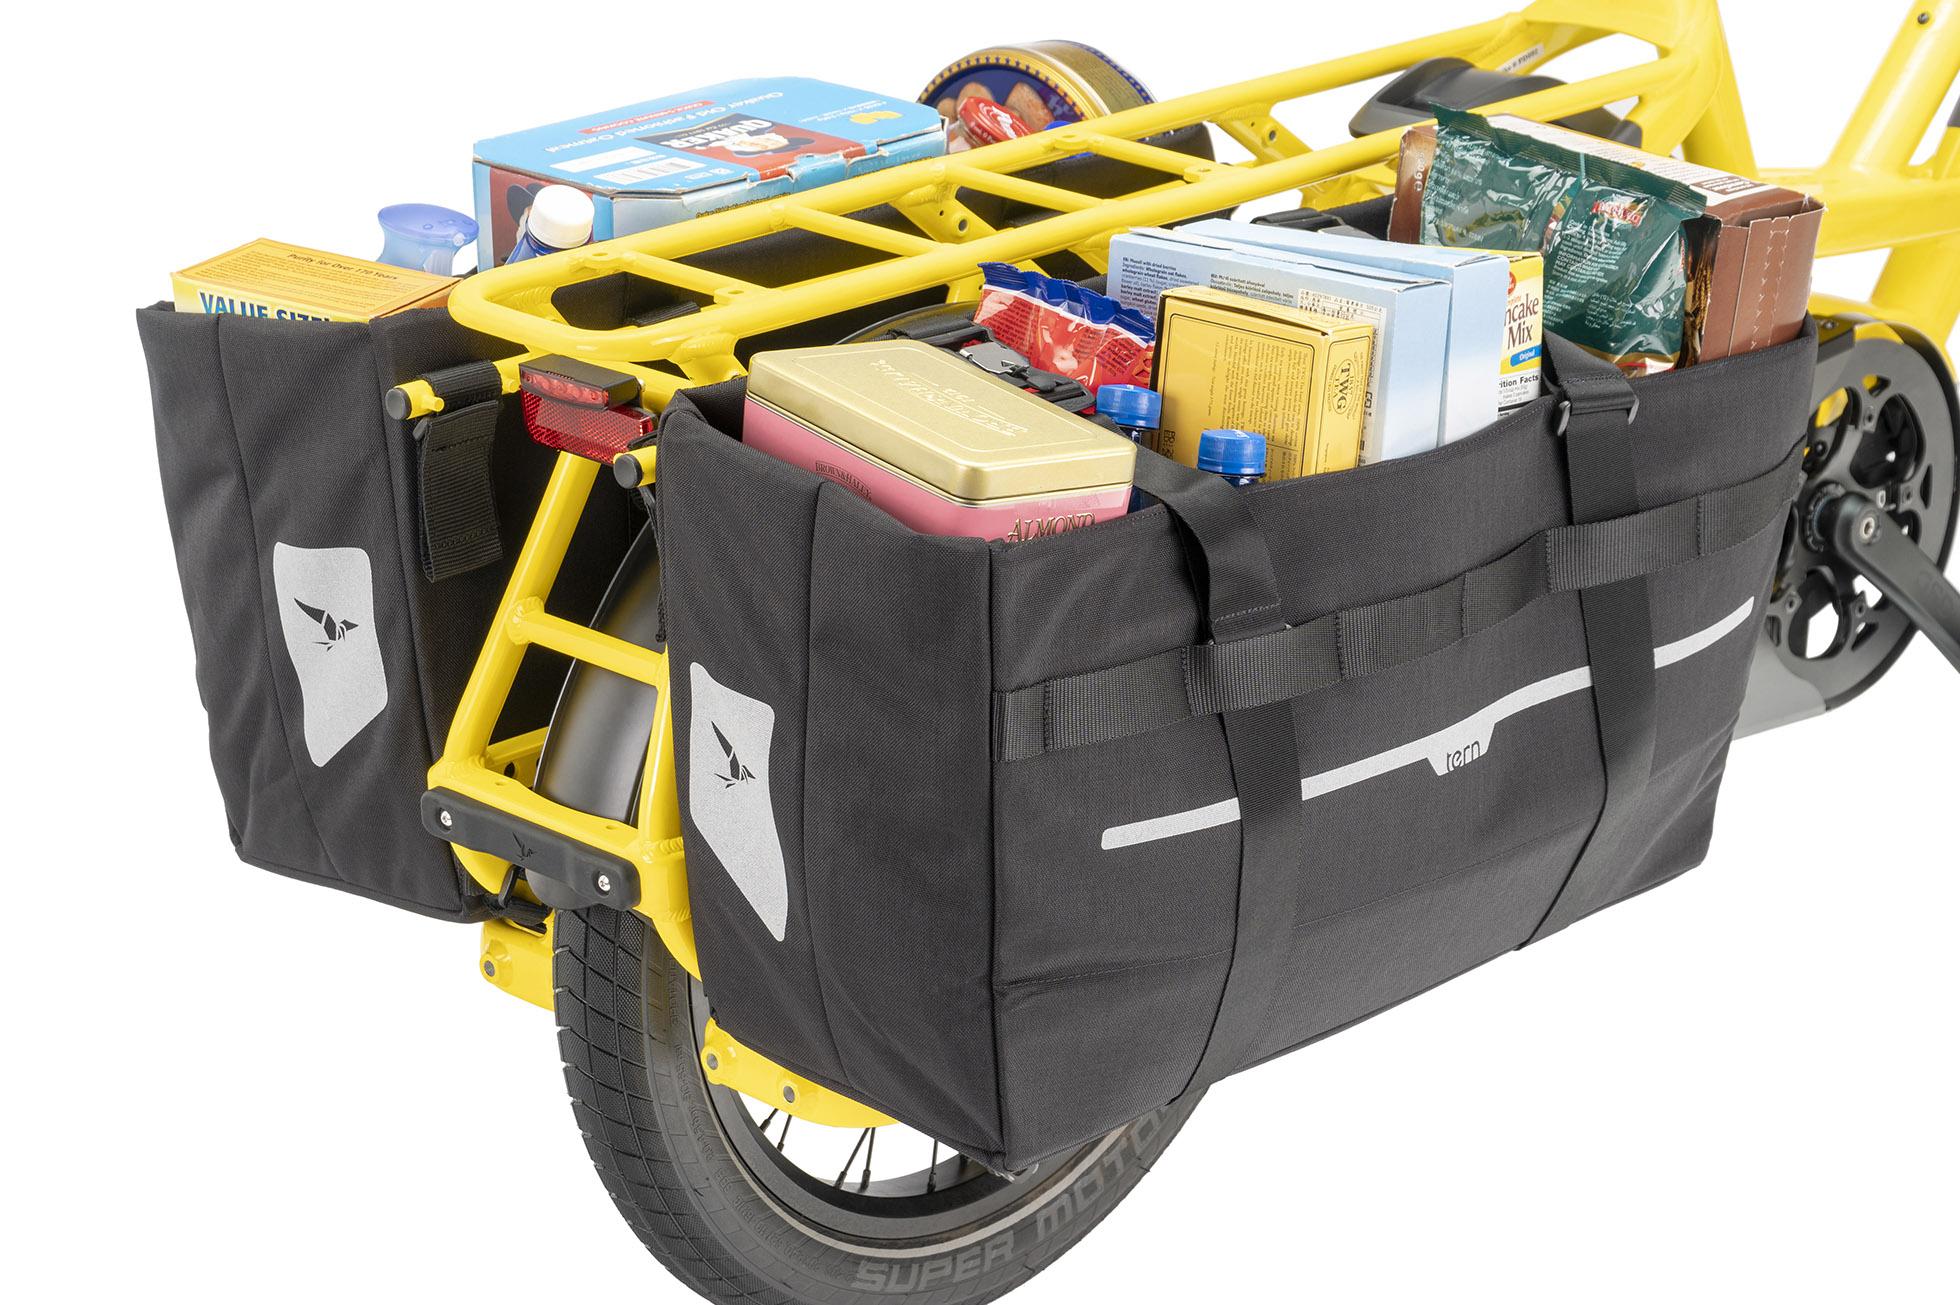 cargohold52-gsdg2-bucket-grocery-web